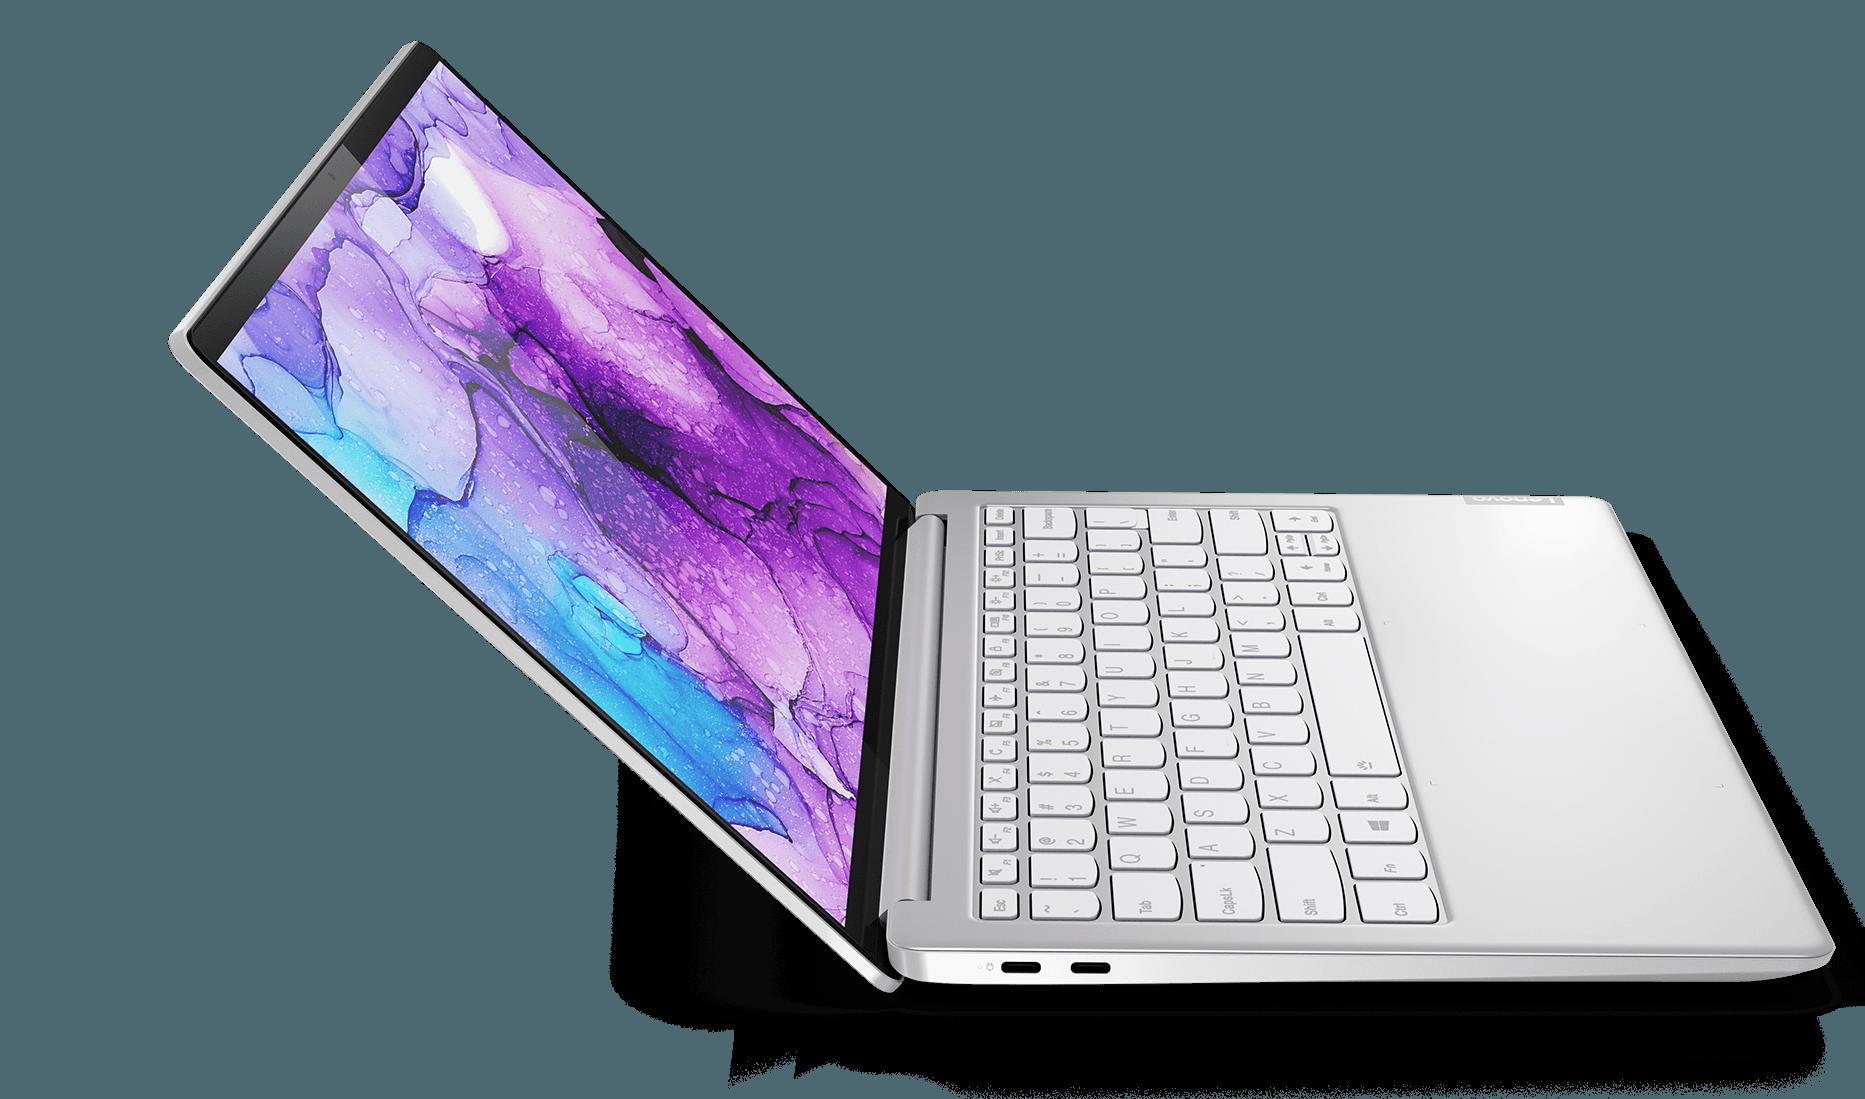 Lenovo_IdeaPad_S540_13inch_White